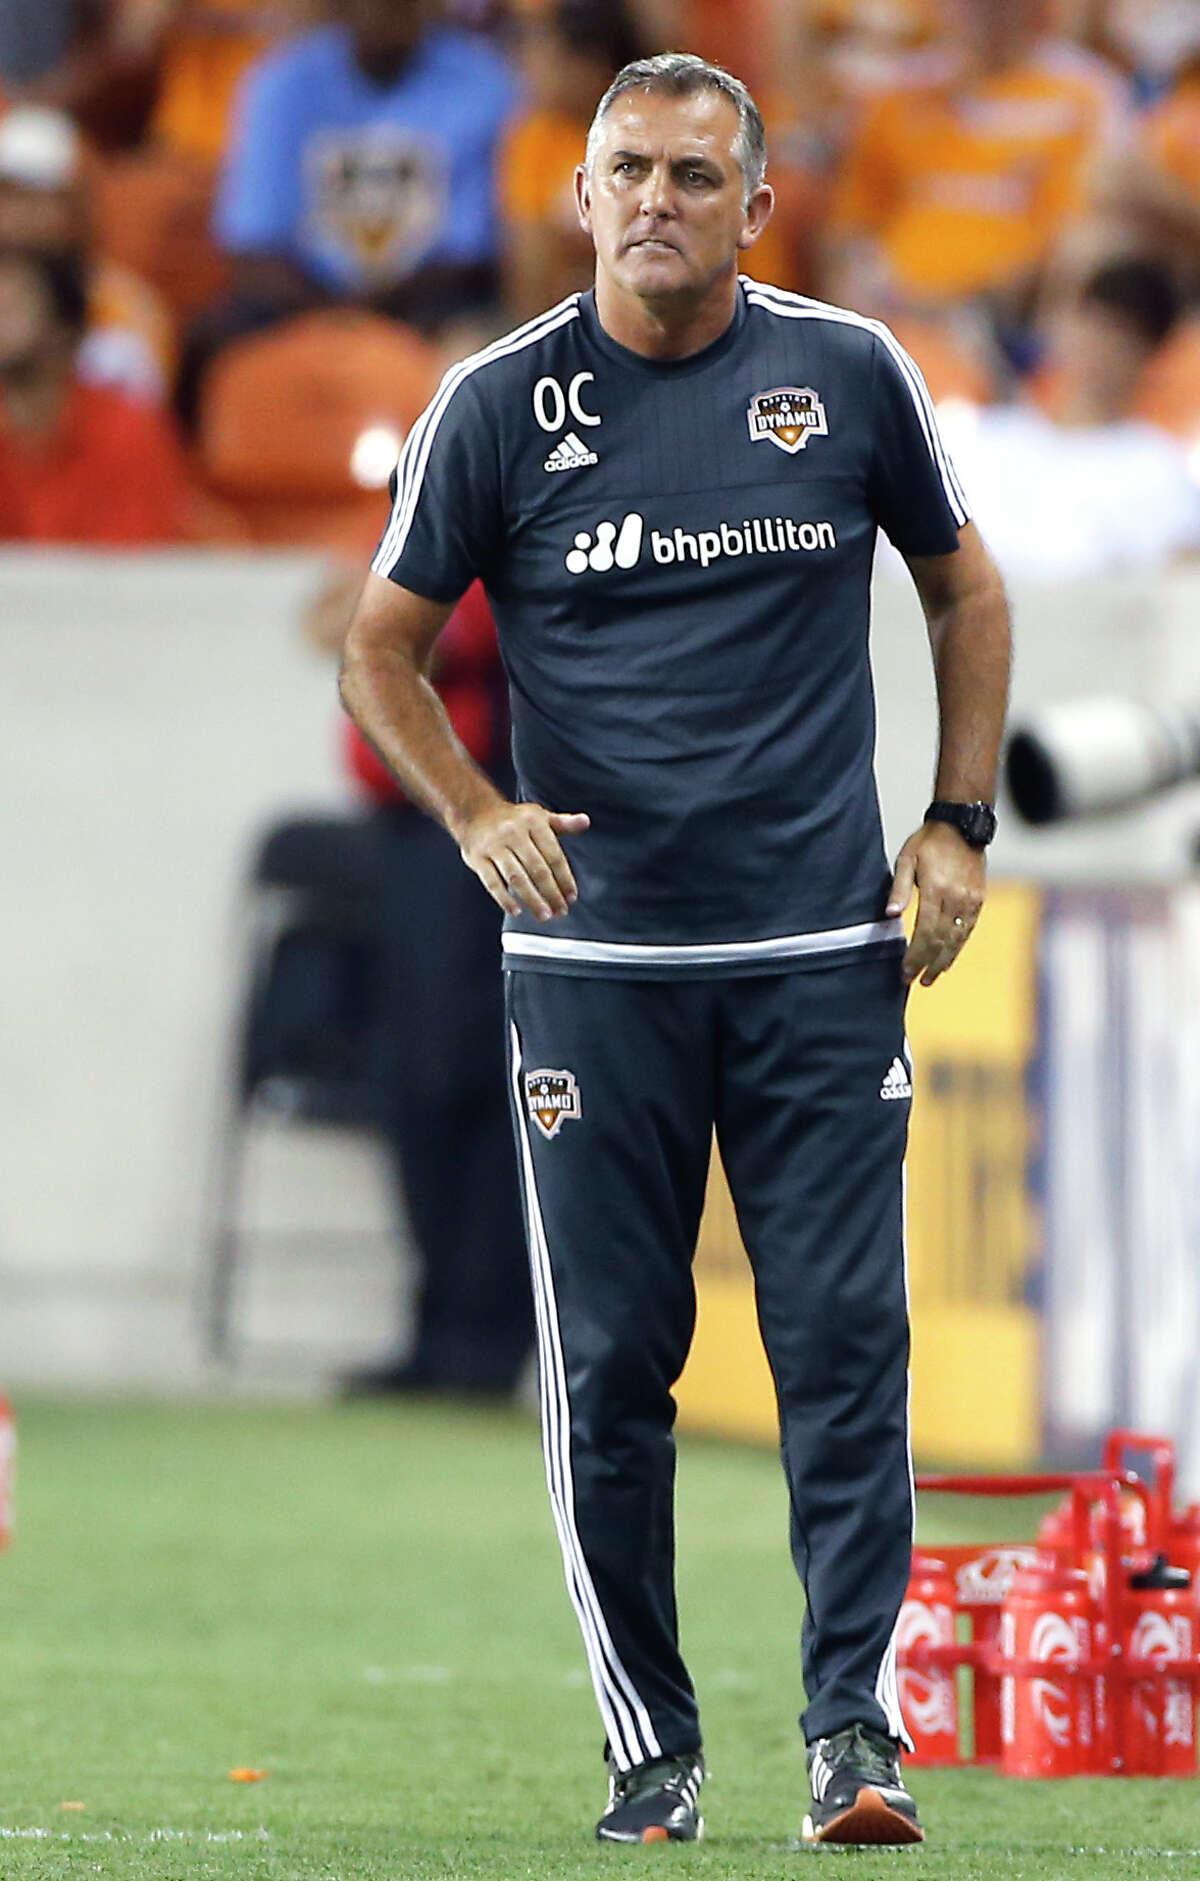 Dynamo coach Owen Coyle shot down a rumor linking him to the Celtic FC job.